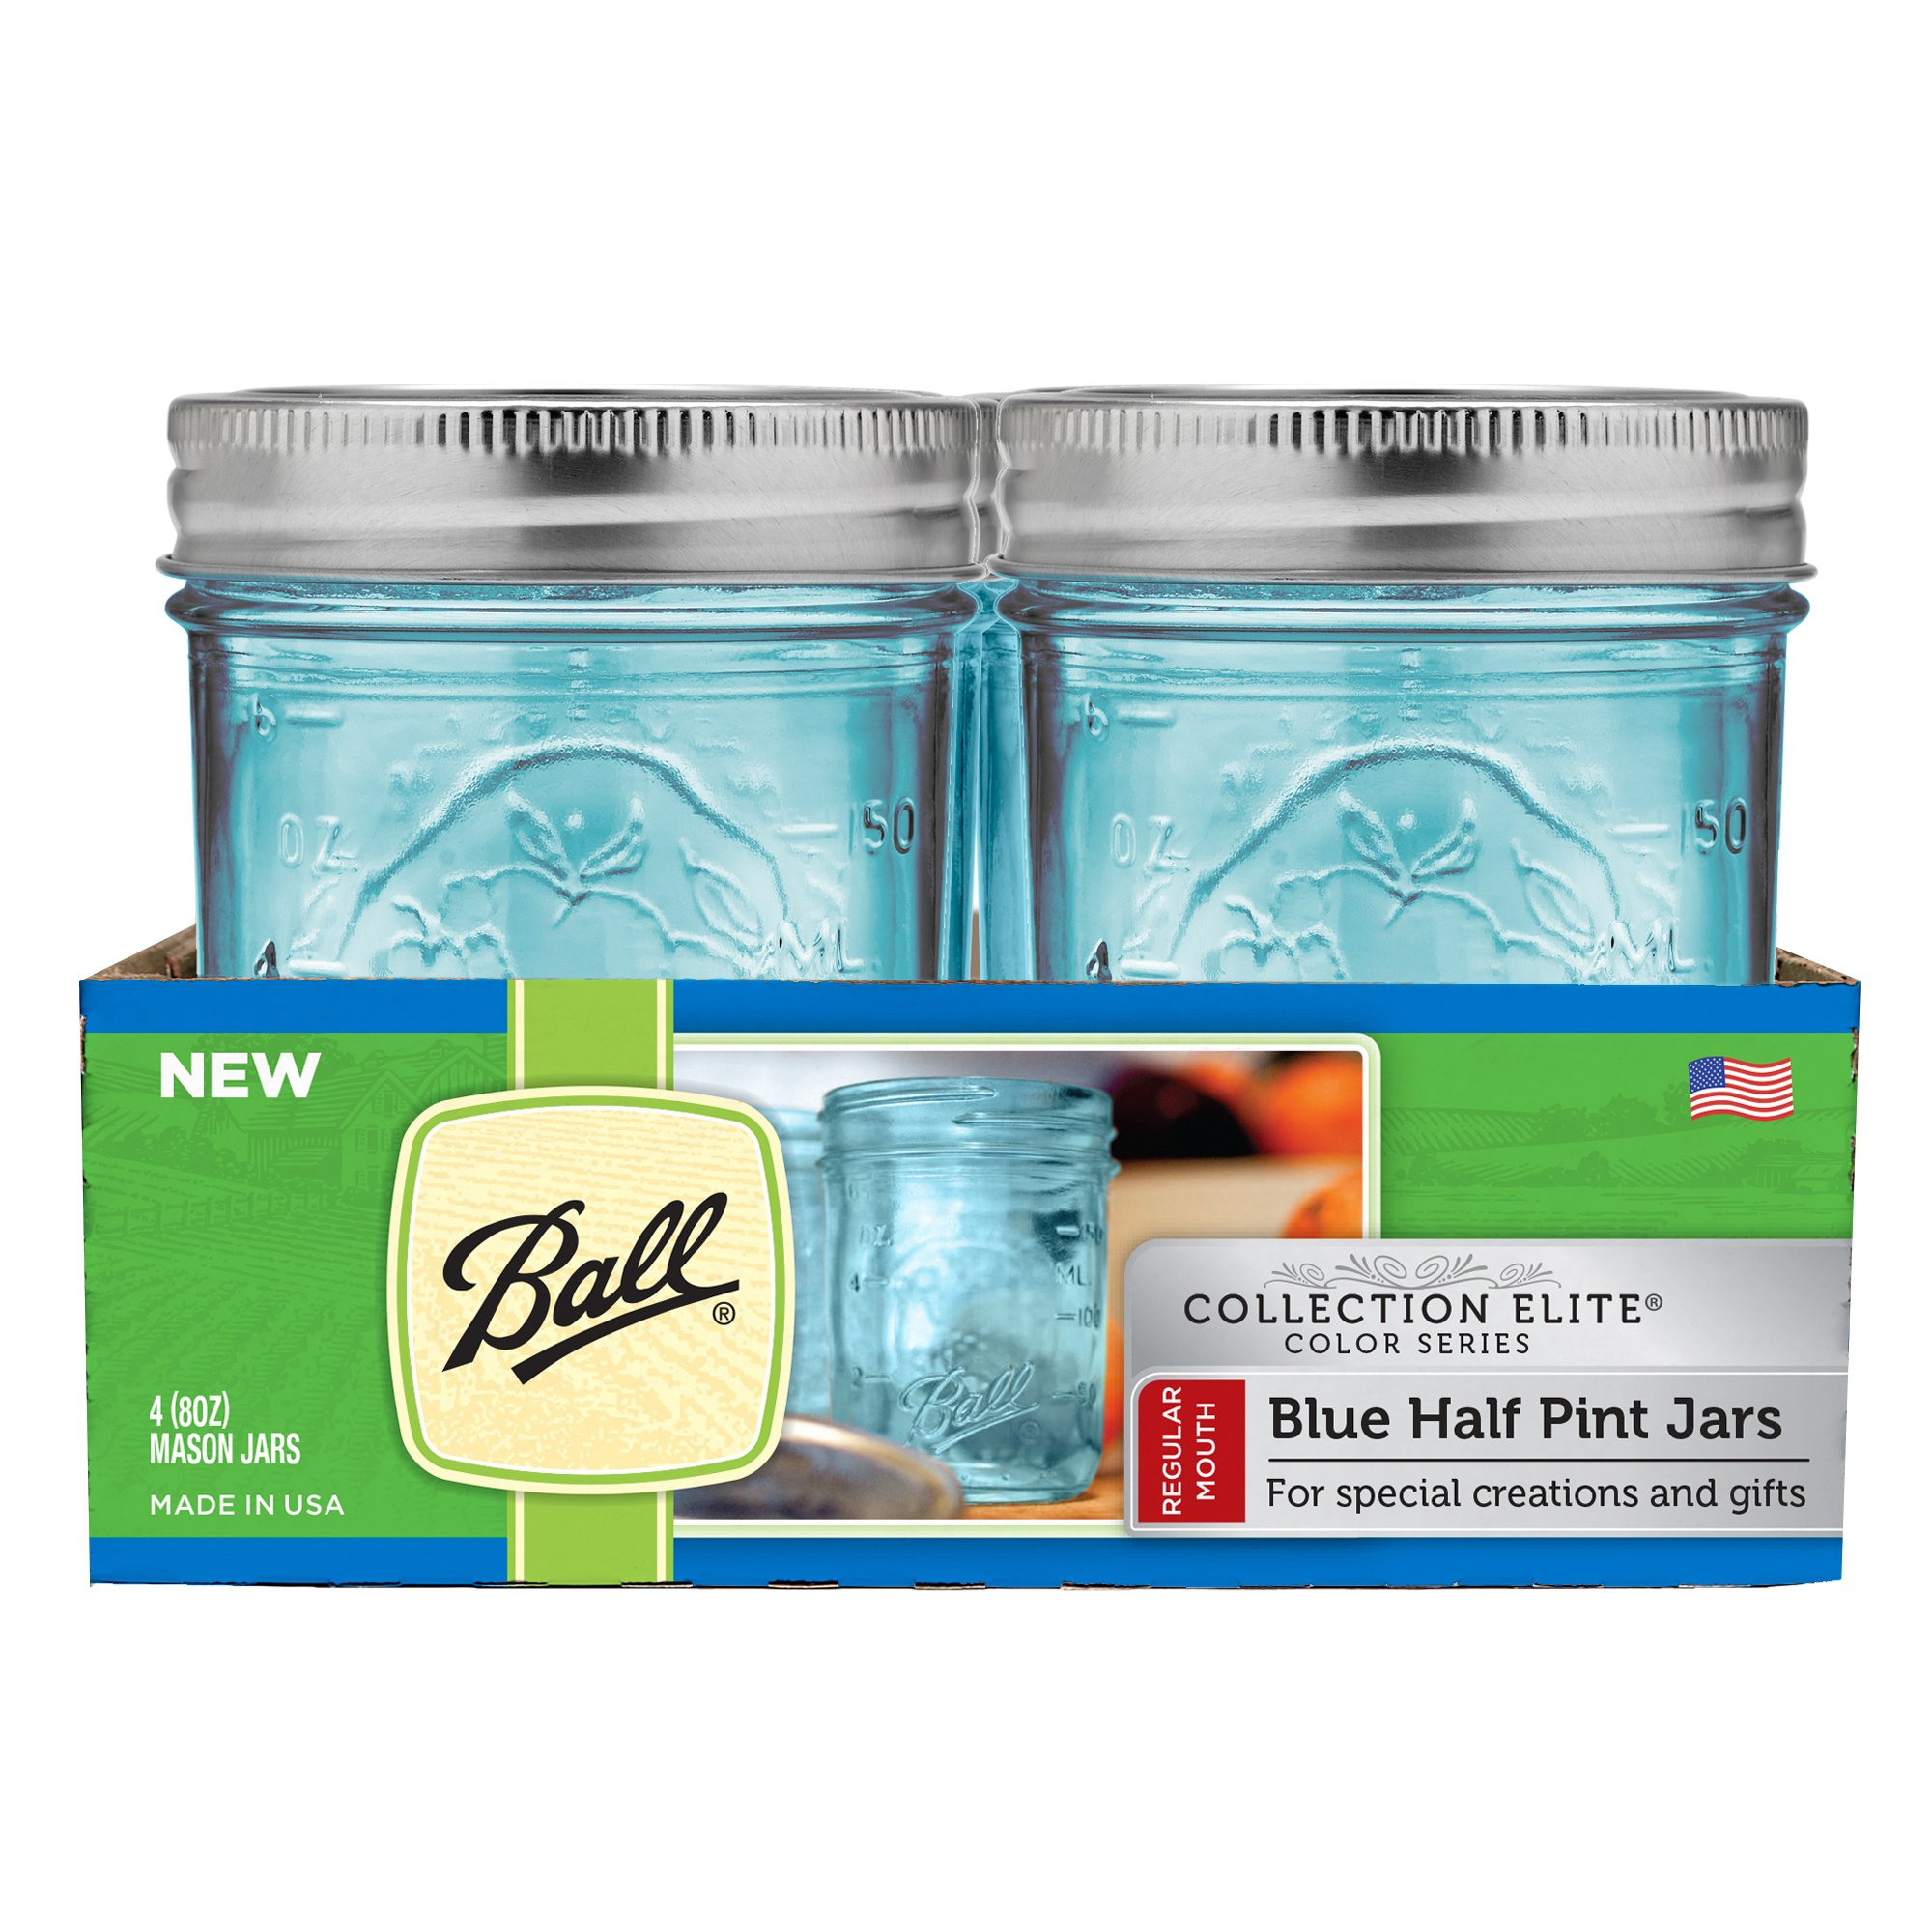 Buy Ball Canning Regular Mouth Half Pint Canning Jar 8 oz. 12-Count ...